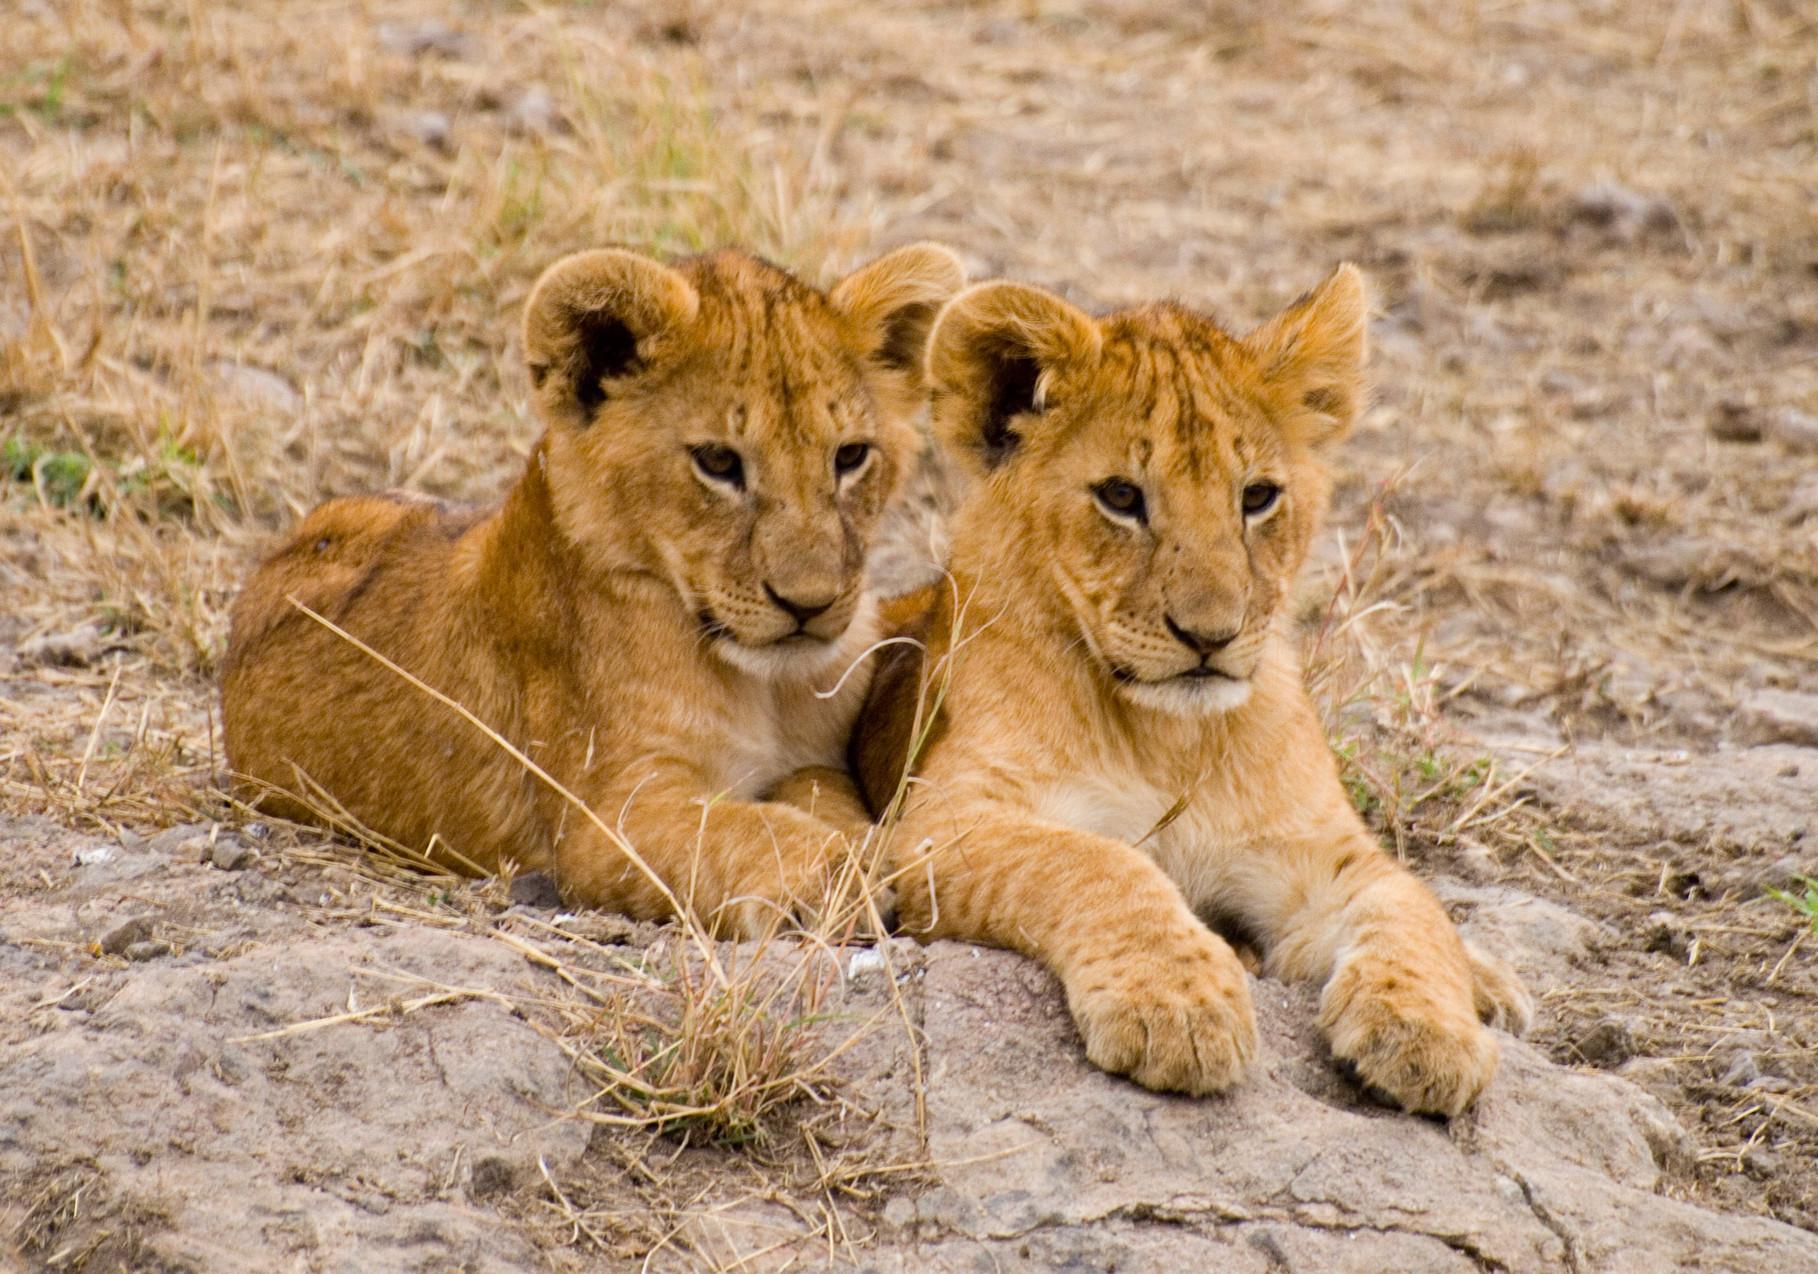 Lions [Serengeti, Tanzania, 2012]